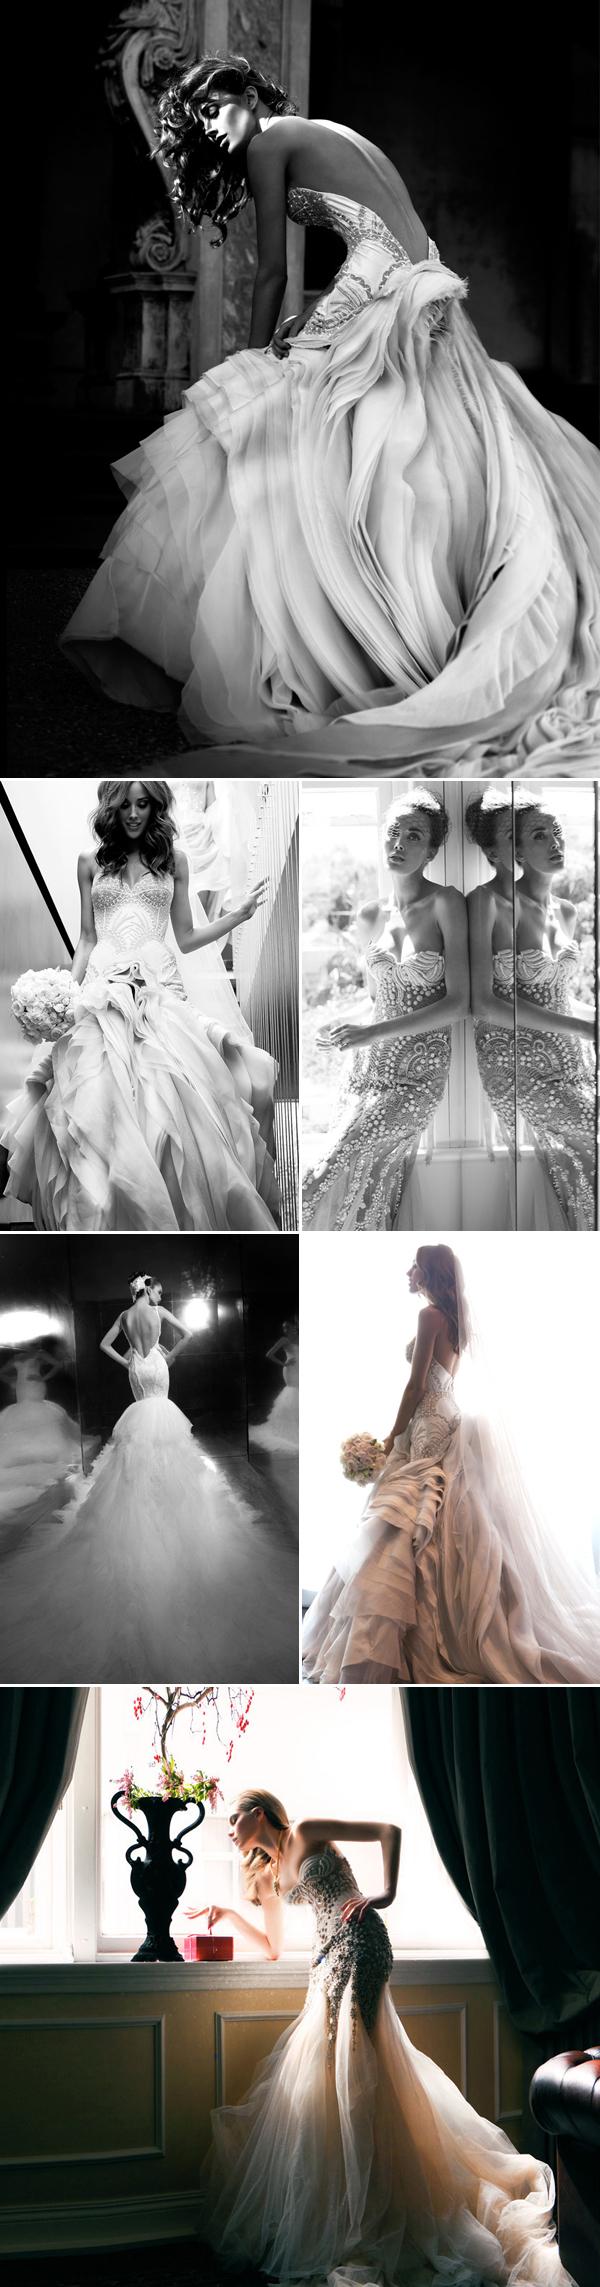 03-JAton-Couture